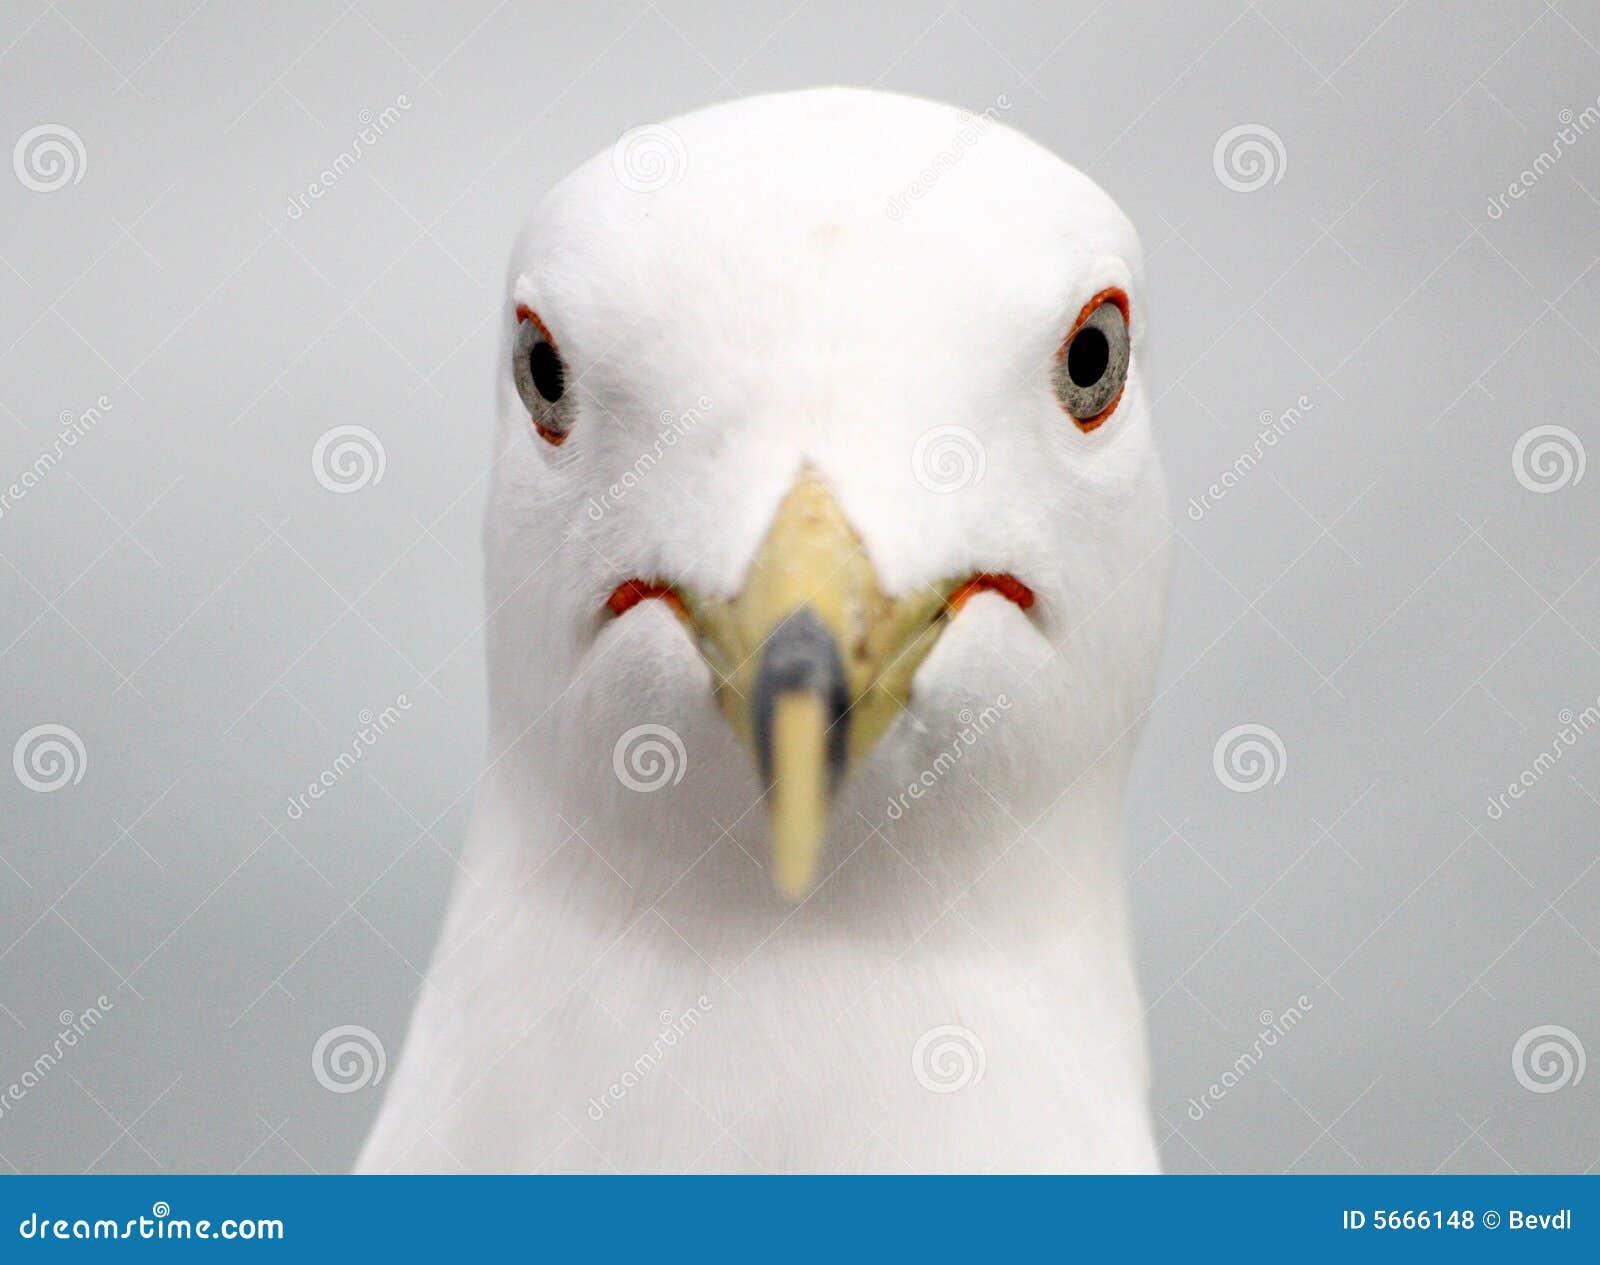 Seagull portrait